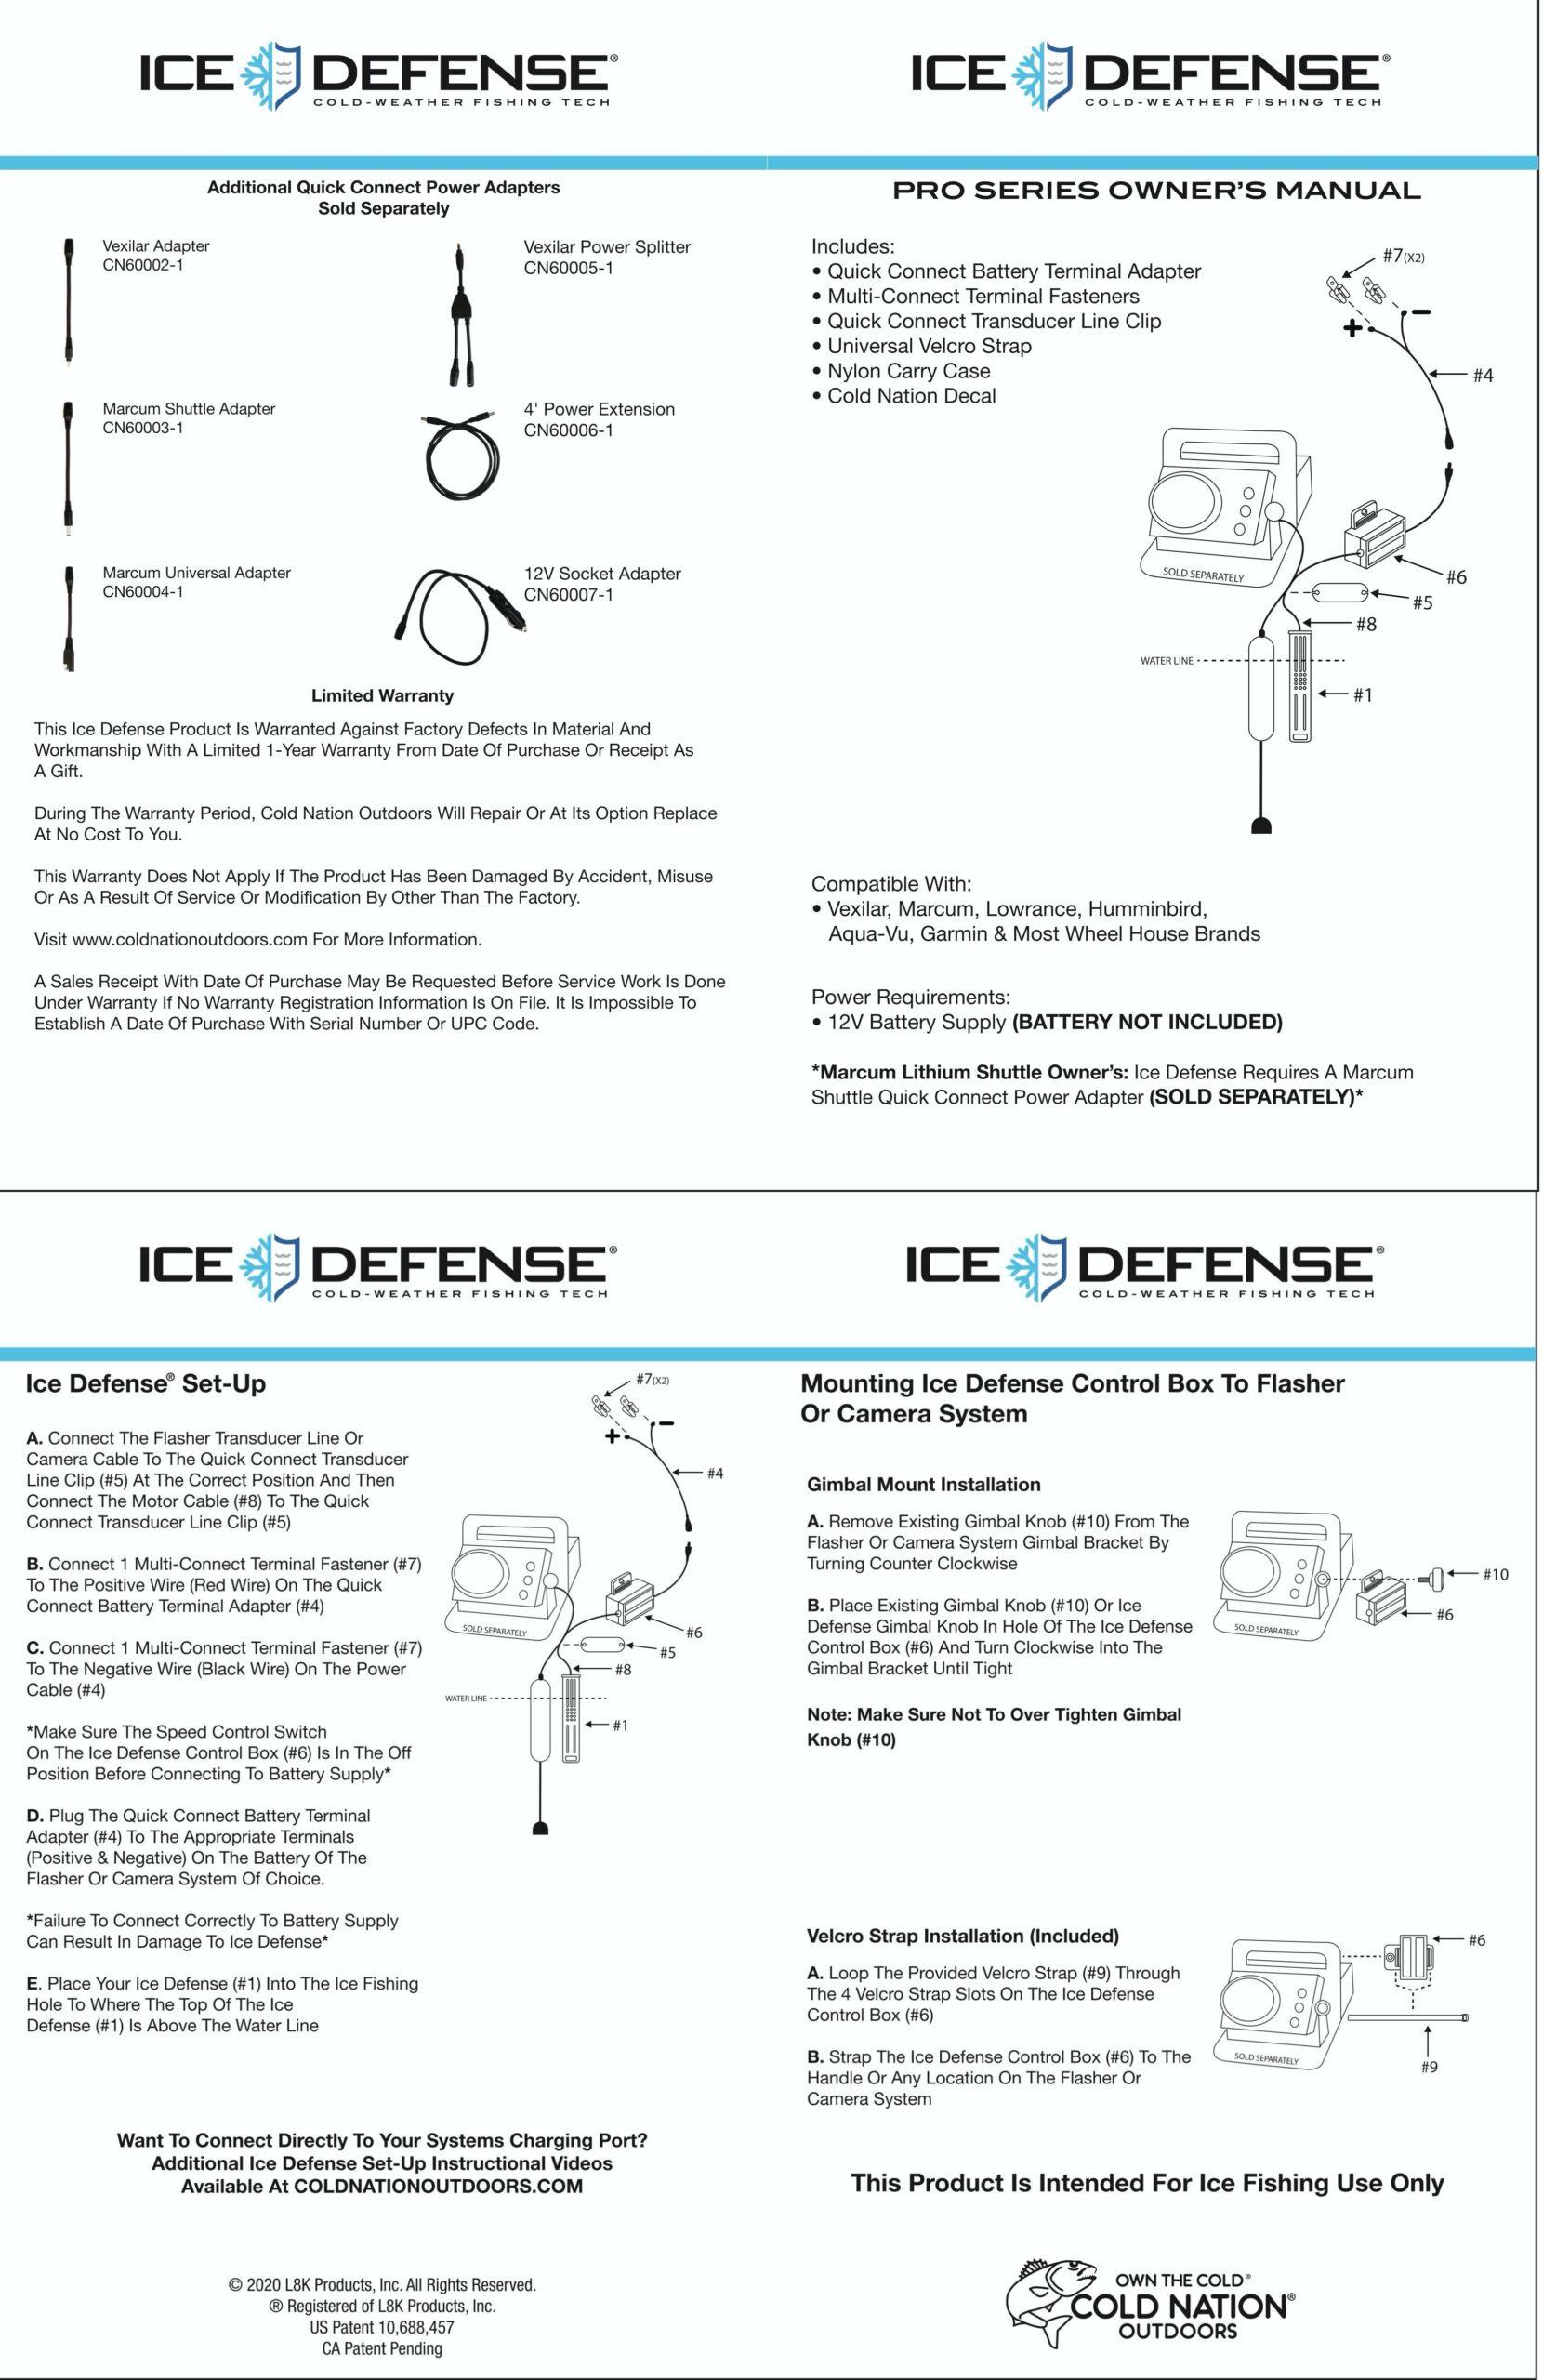 Ice Defense Manual 09_30_20